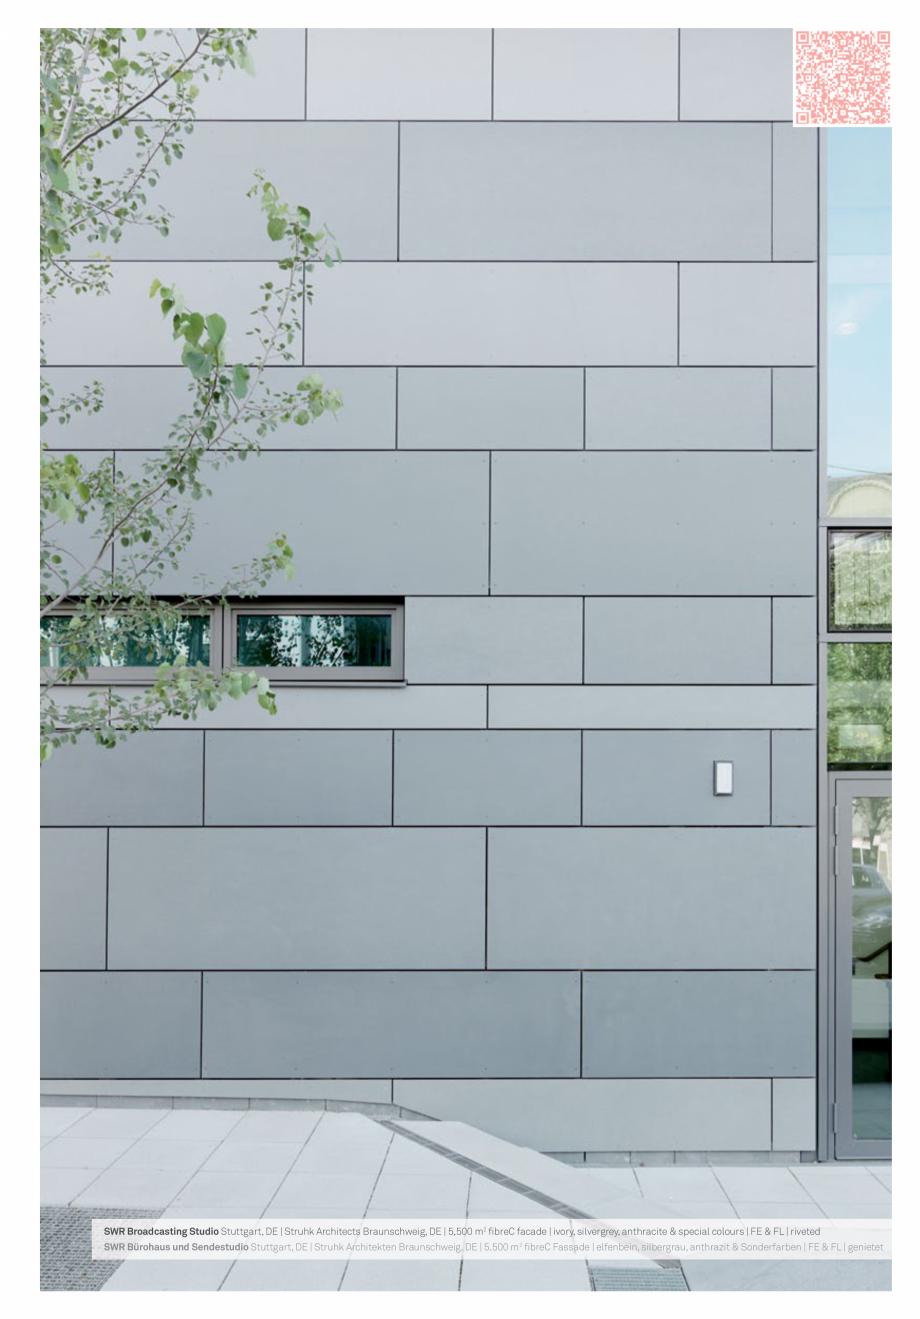 Pagina 19 - Panouri din beton aparent RIEDER Concrete Skin Lucrari, proiecte Engleza m that appeals ...